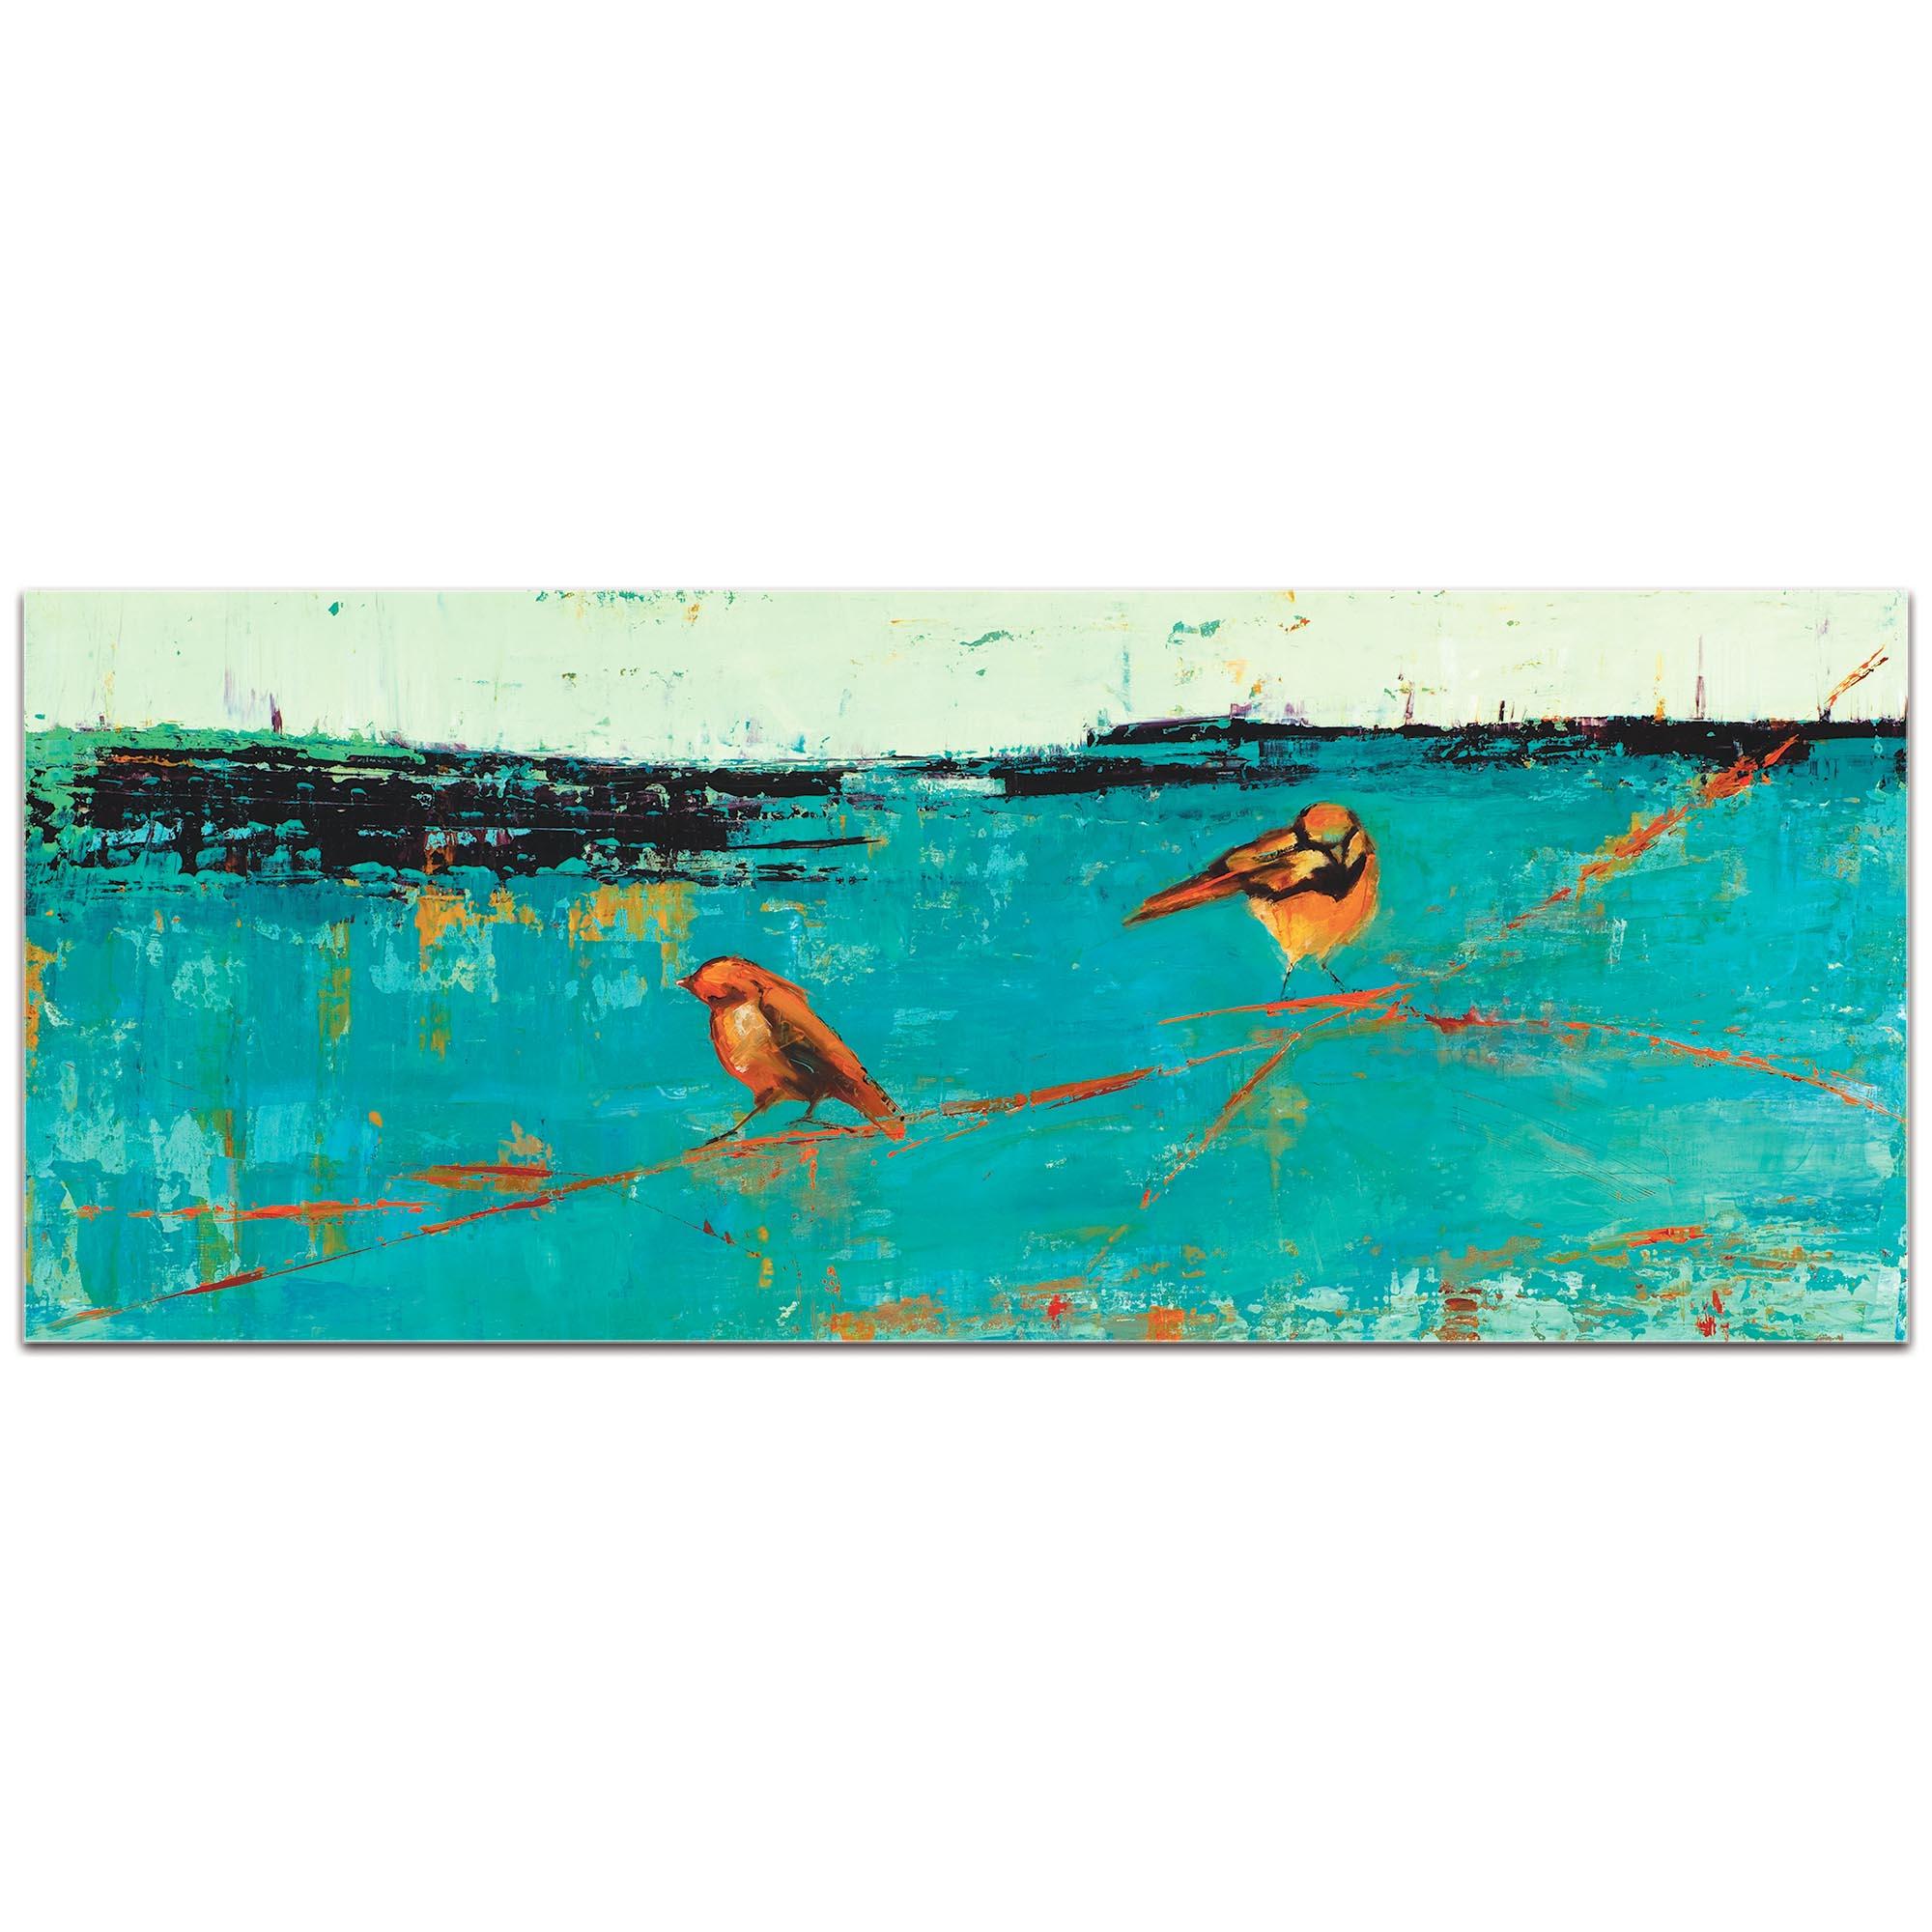 Contemporary Wall Art 'Two Chickadees on a Blue Horizon v2' - Urban Birds Decor on Metal or Plexiglass - Image 2